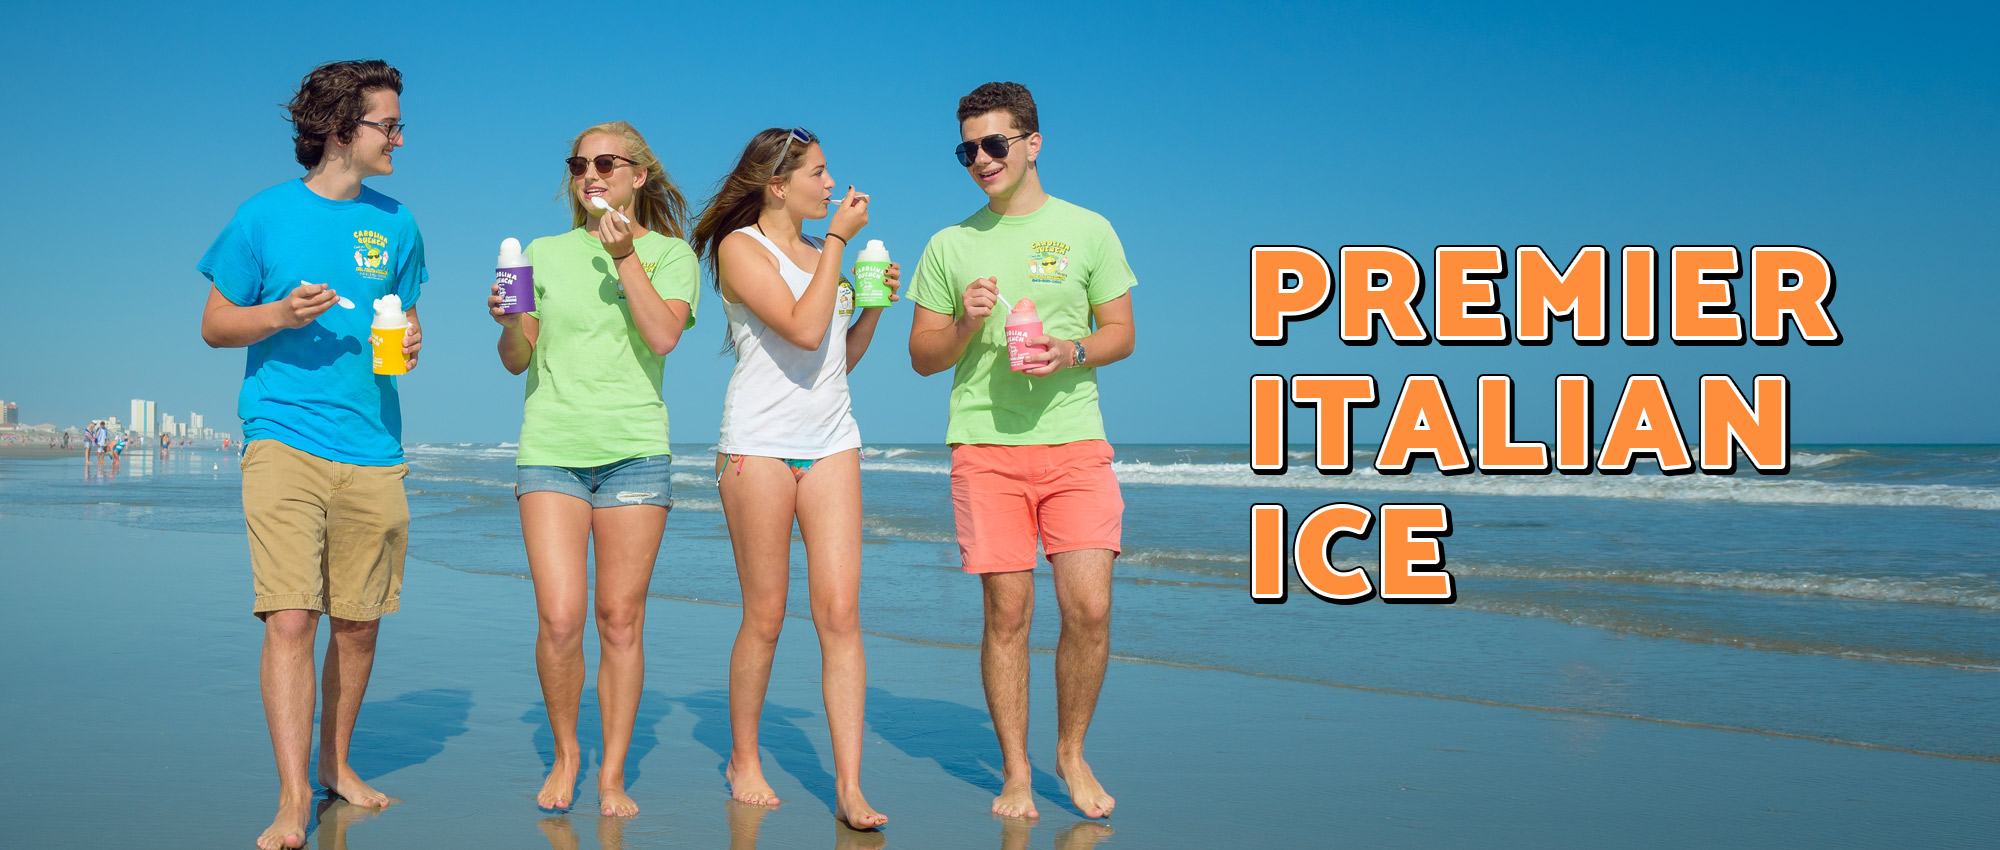 4-premier-italian-ice